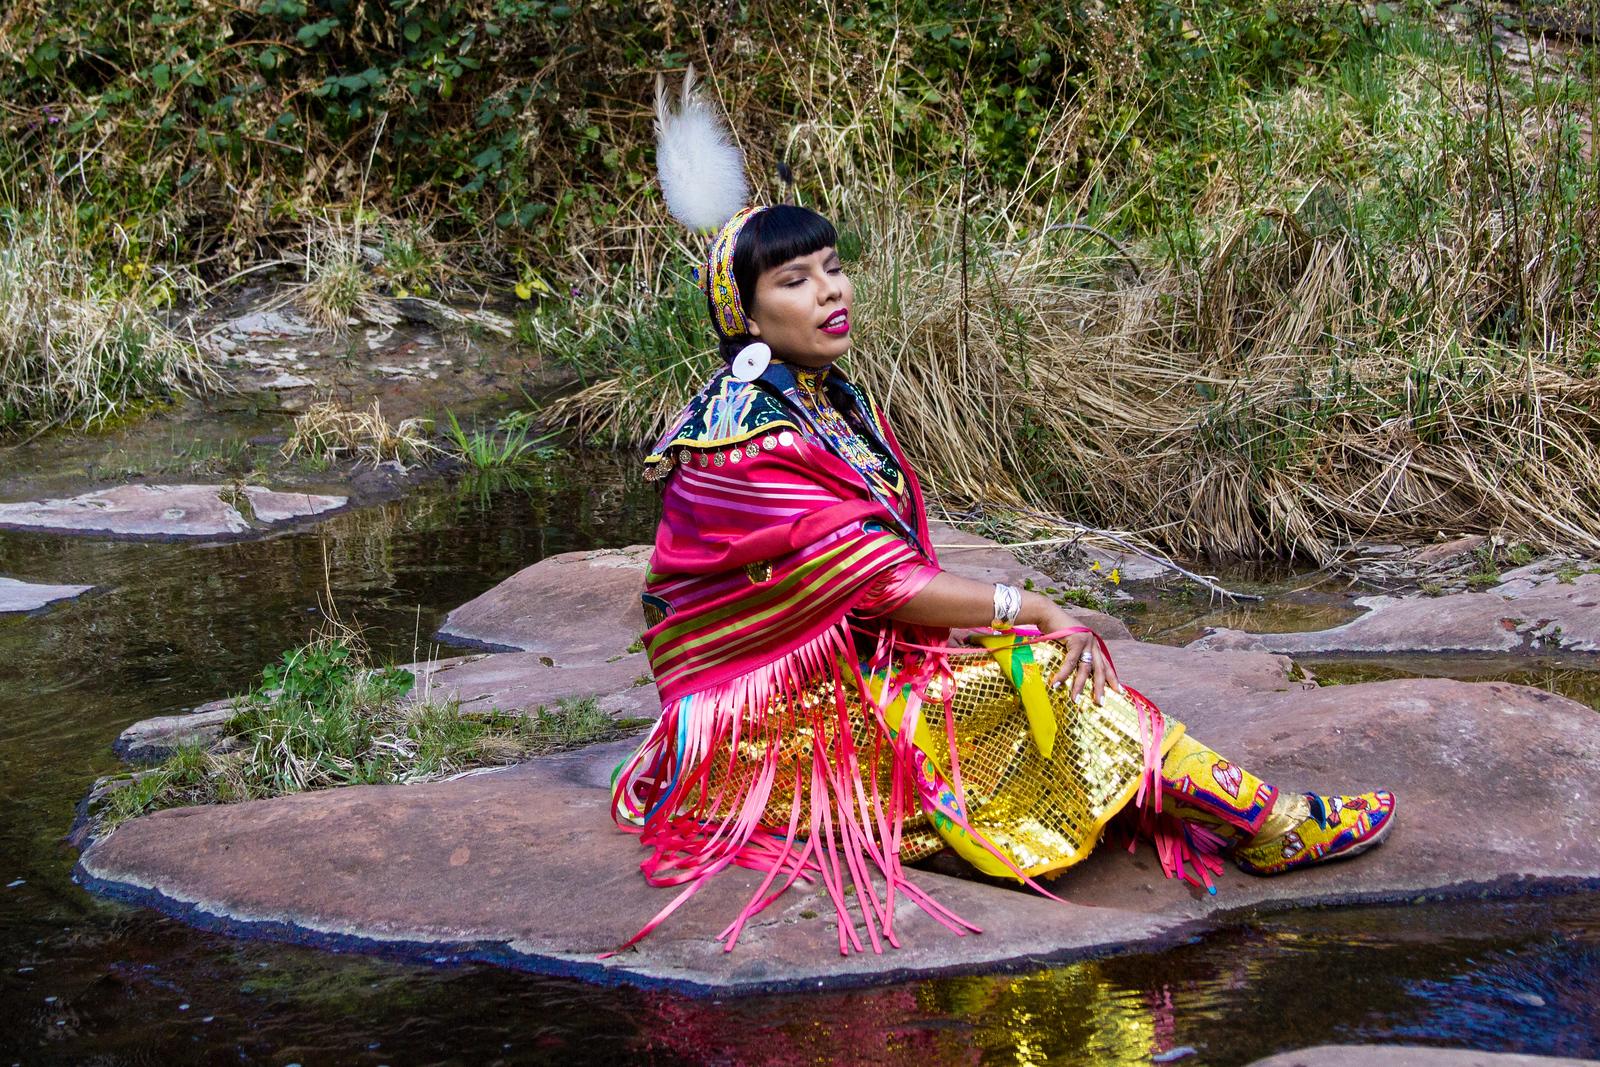 Yolanda by the Stream